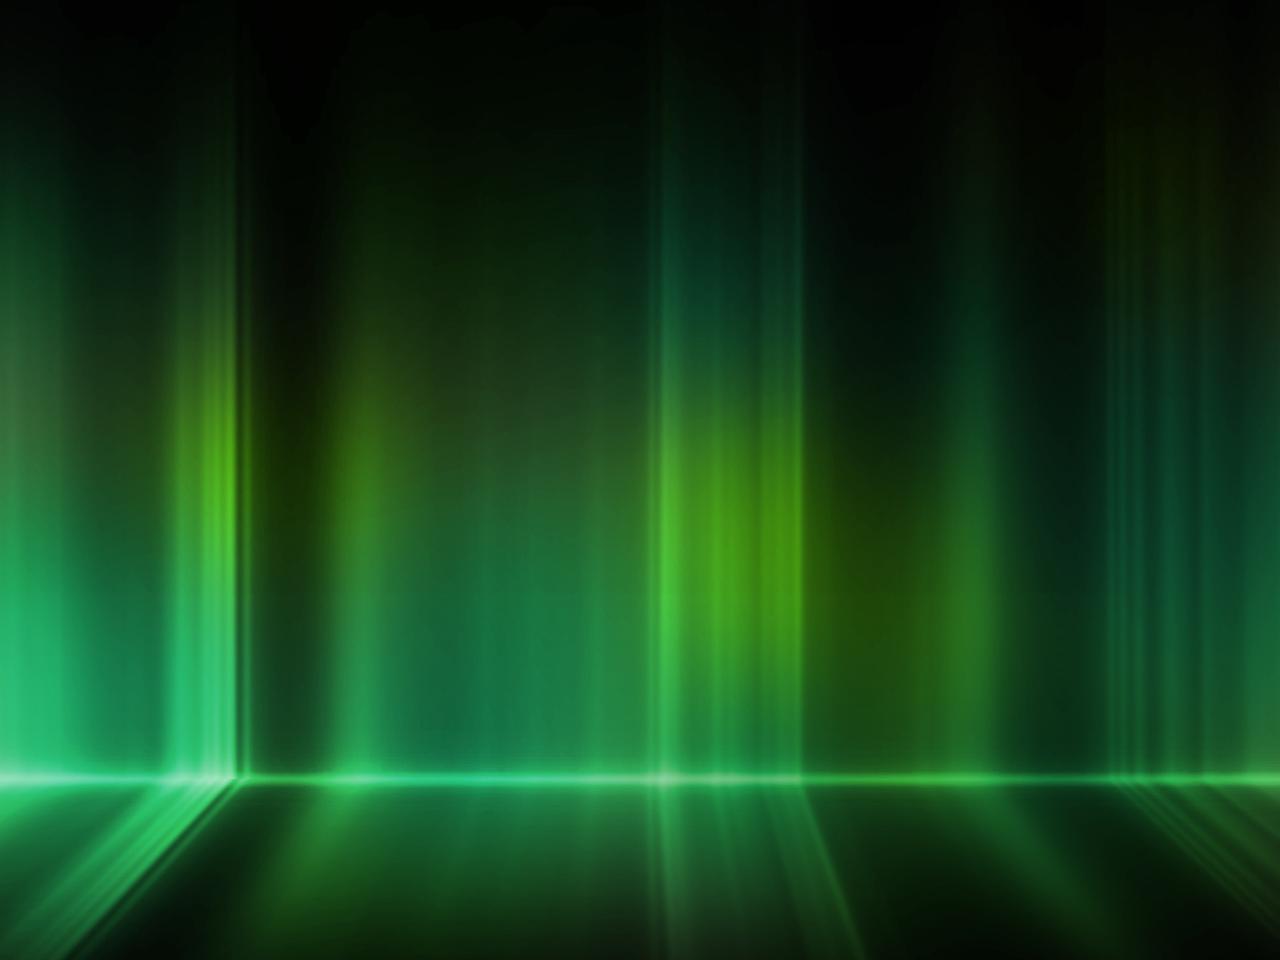 [50+] Dark Green Background Wallpaper on WallpaperSafari